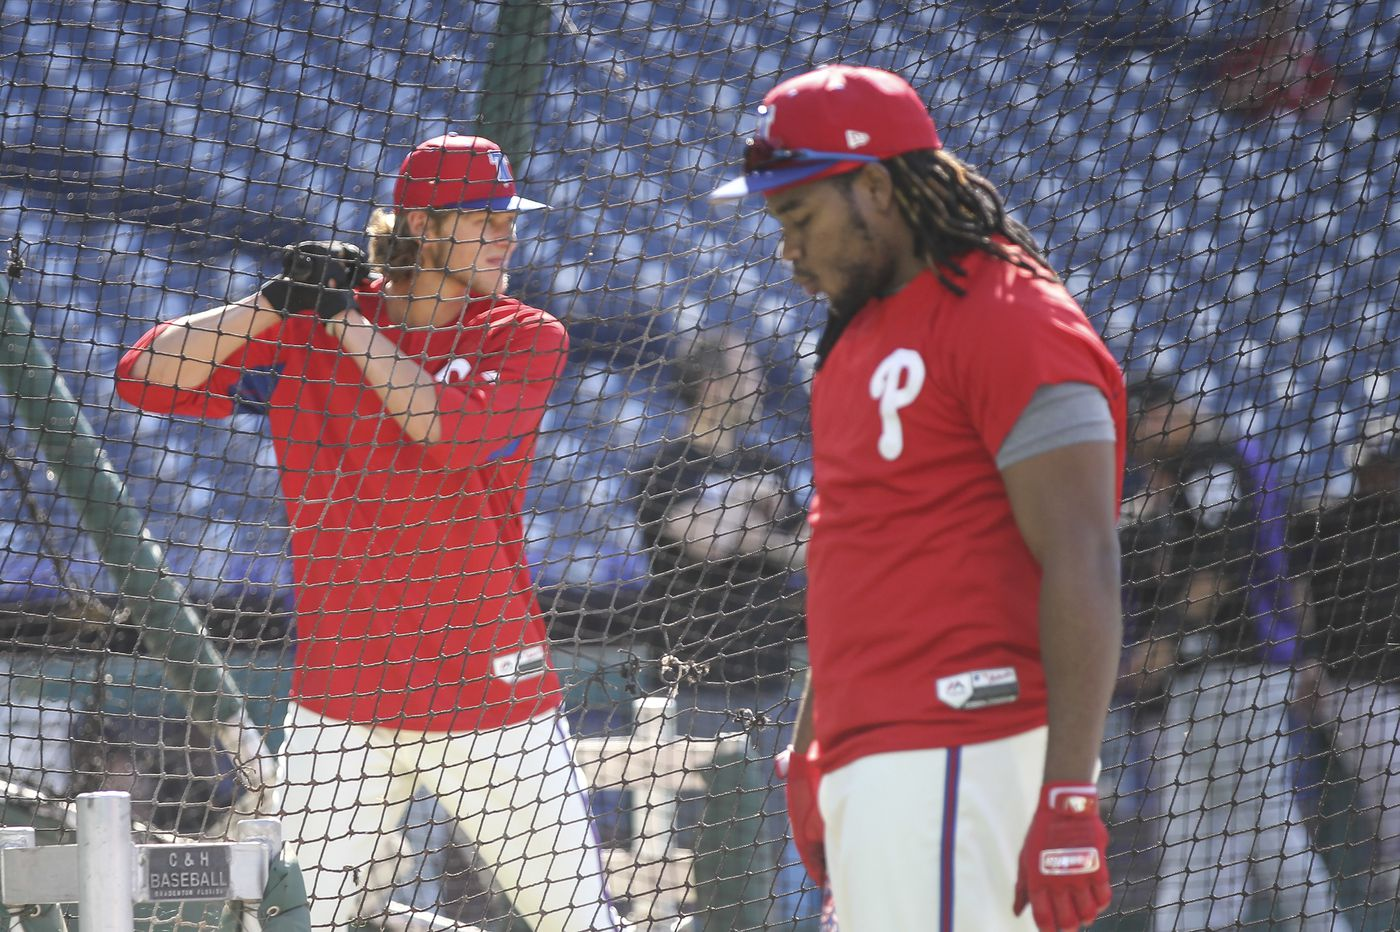 Phillies' Maikel Franco adjusting to life as a platoon player; Alec Bohm impresses Gabe Kapler